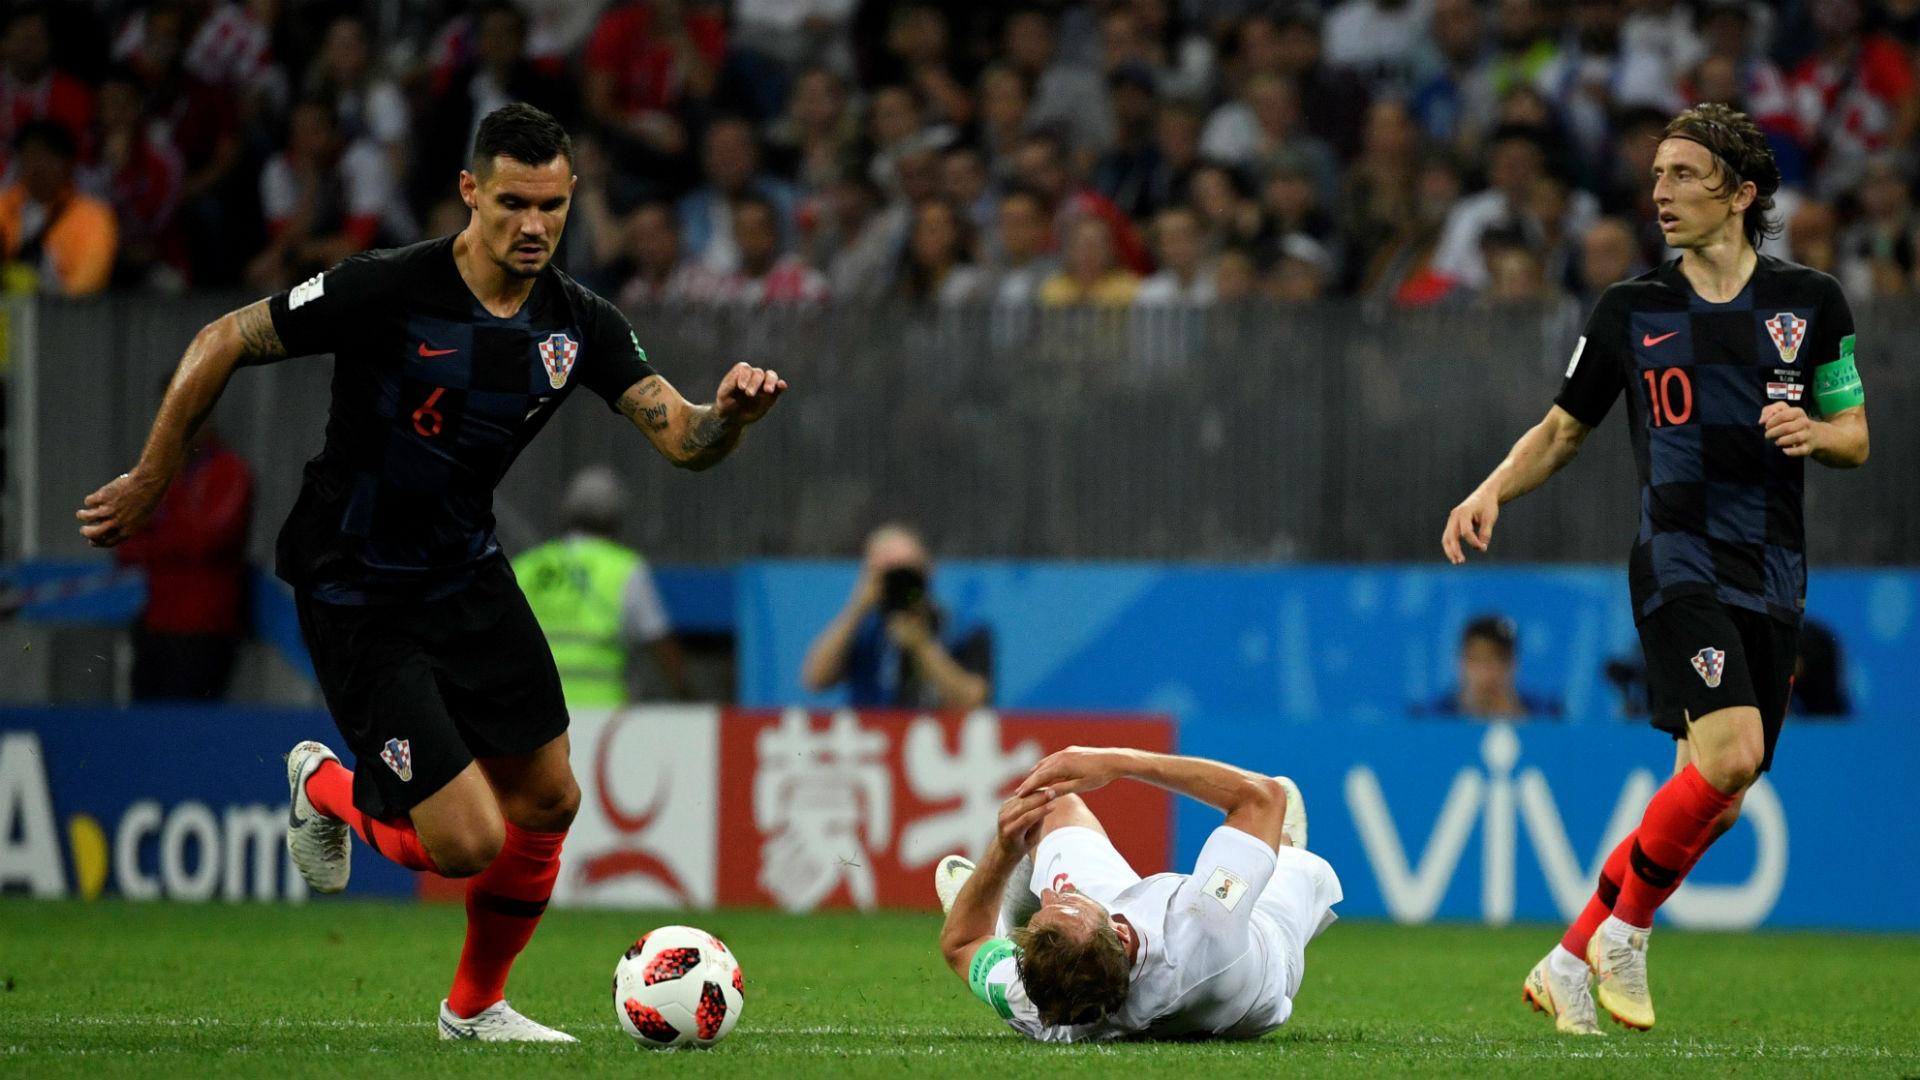 croatia england - dejan lovren luka modric - world cup - 11072018